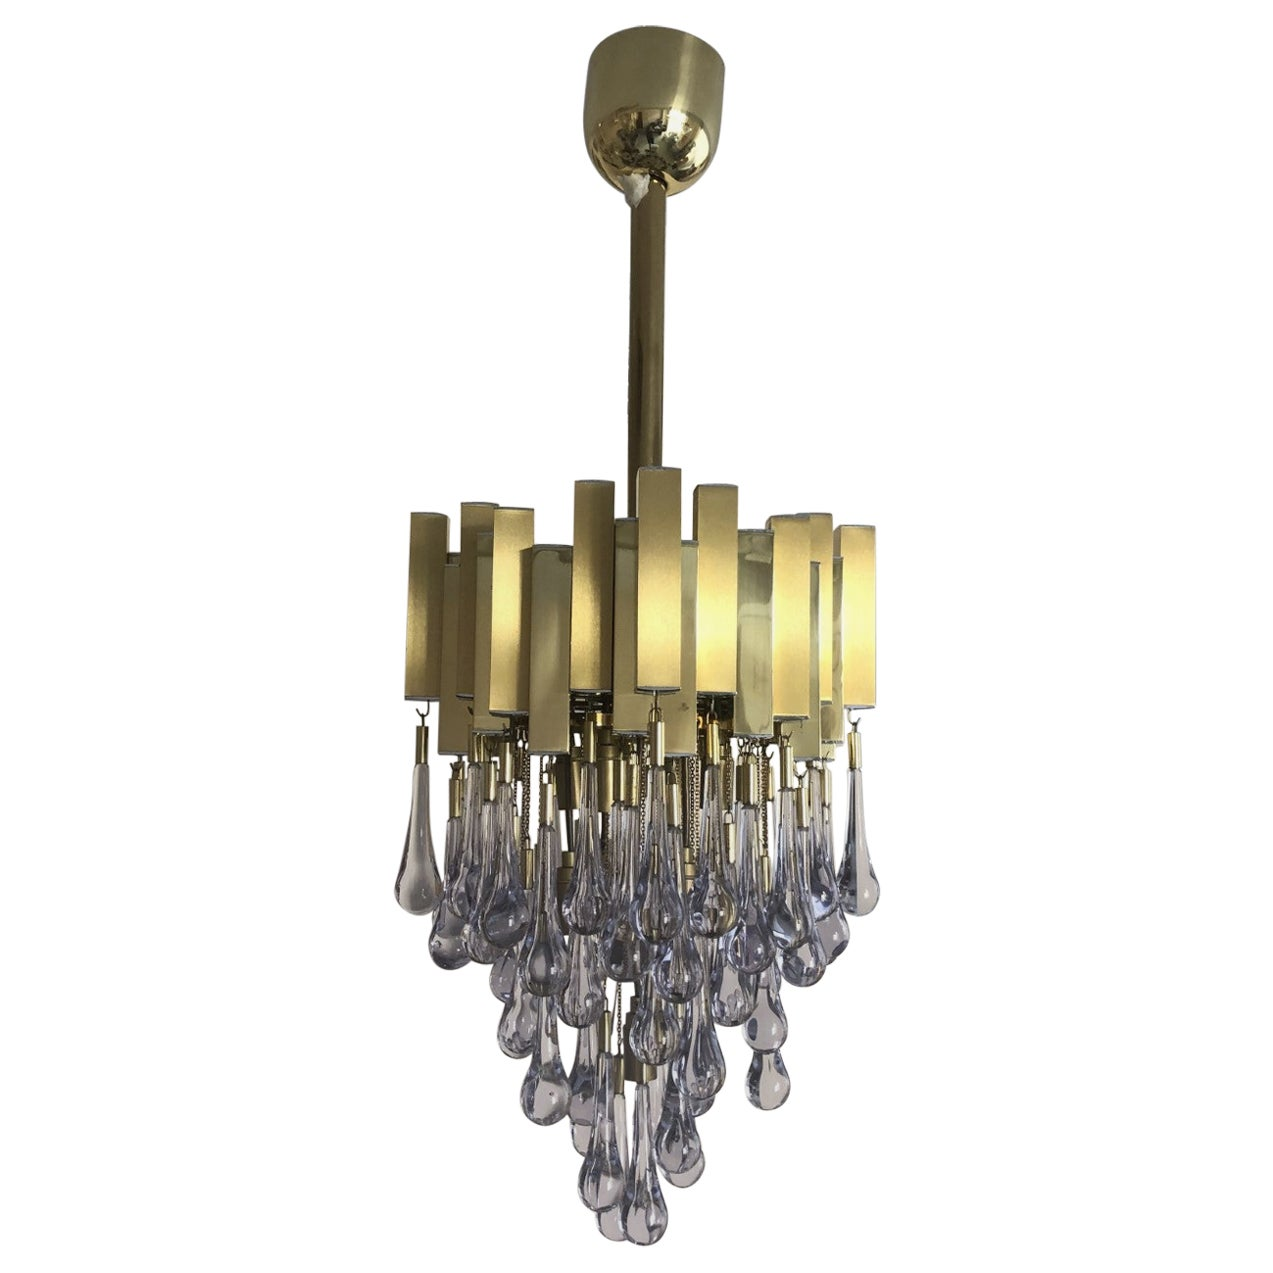 Midcentury Teardrop Golden Brass Long Chandelier by Gaetano Sciolari, 1970s